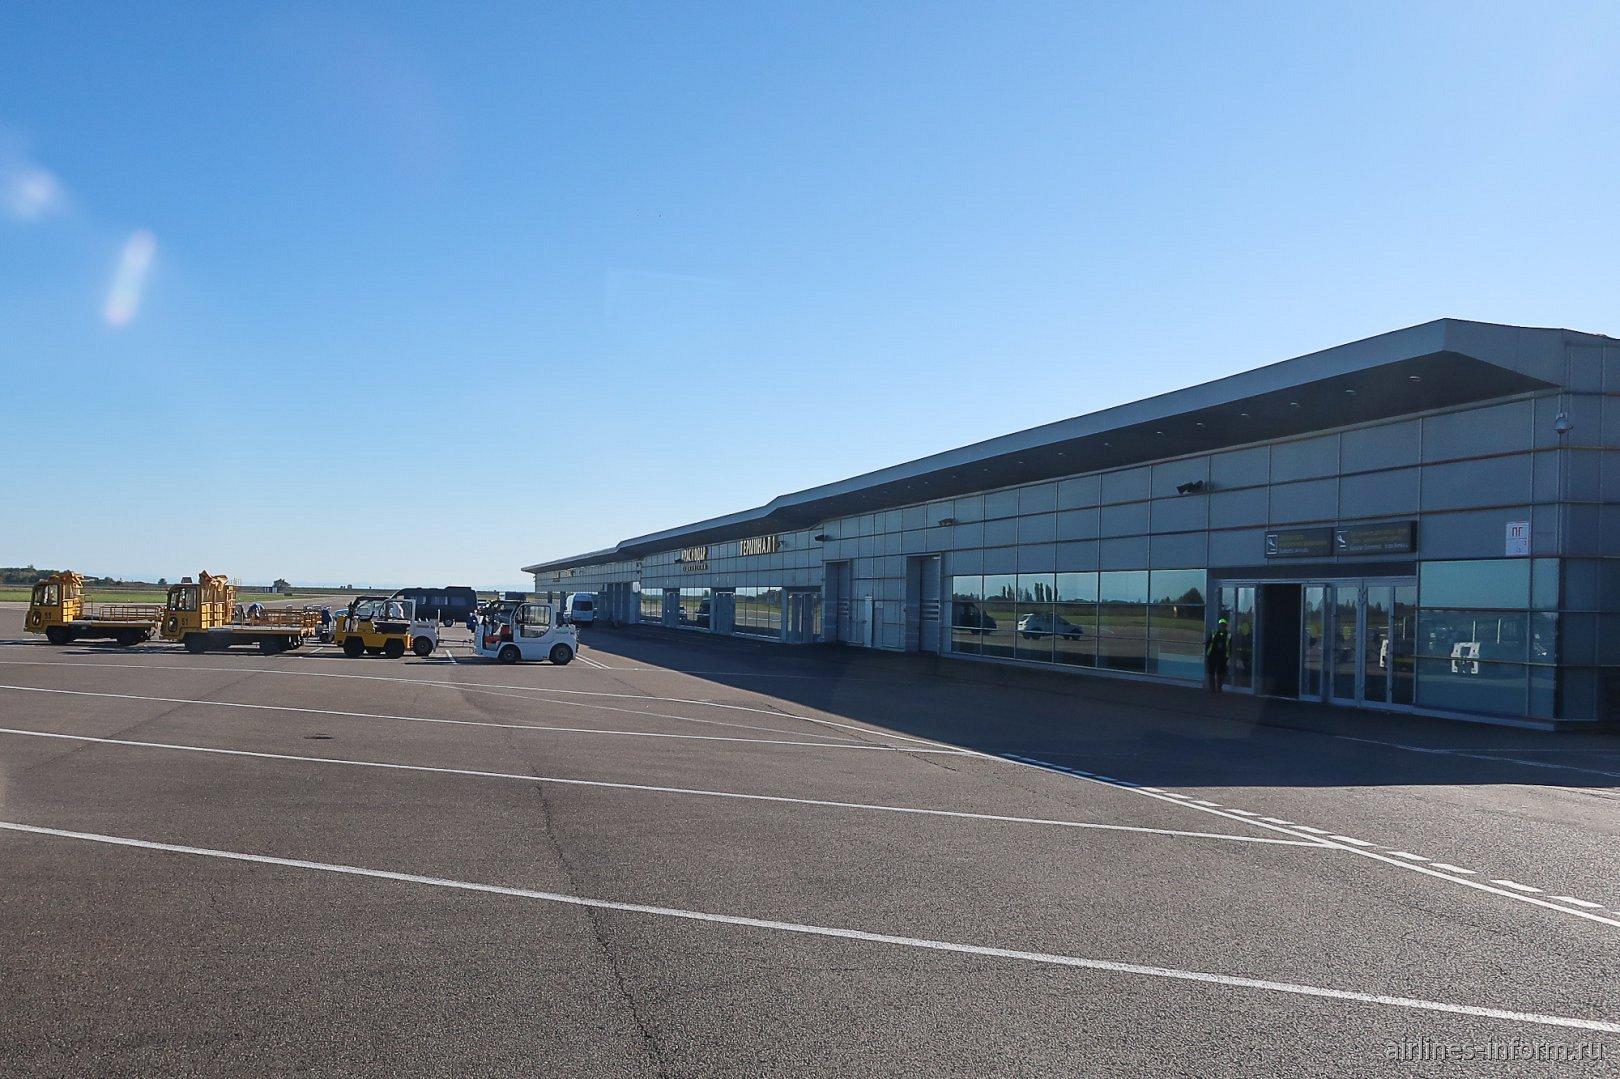 Вид с перрона на пассажирский терминал аэропорта Краснодар